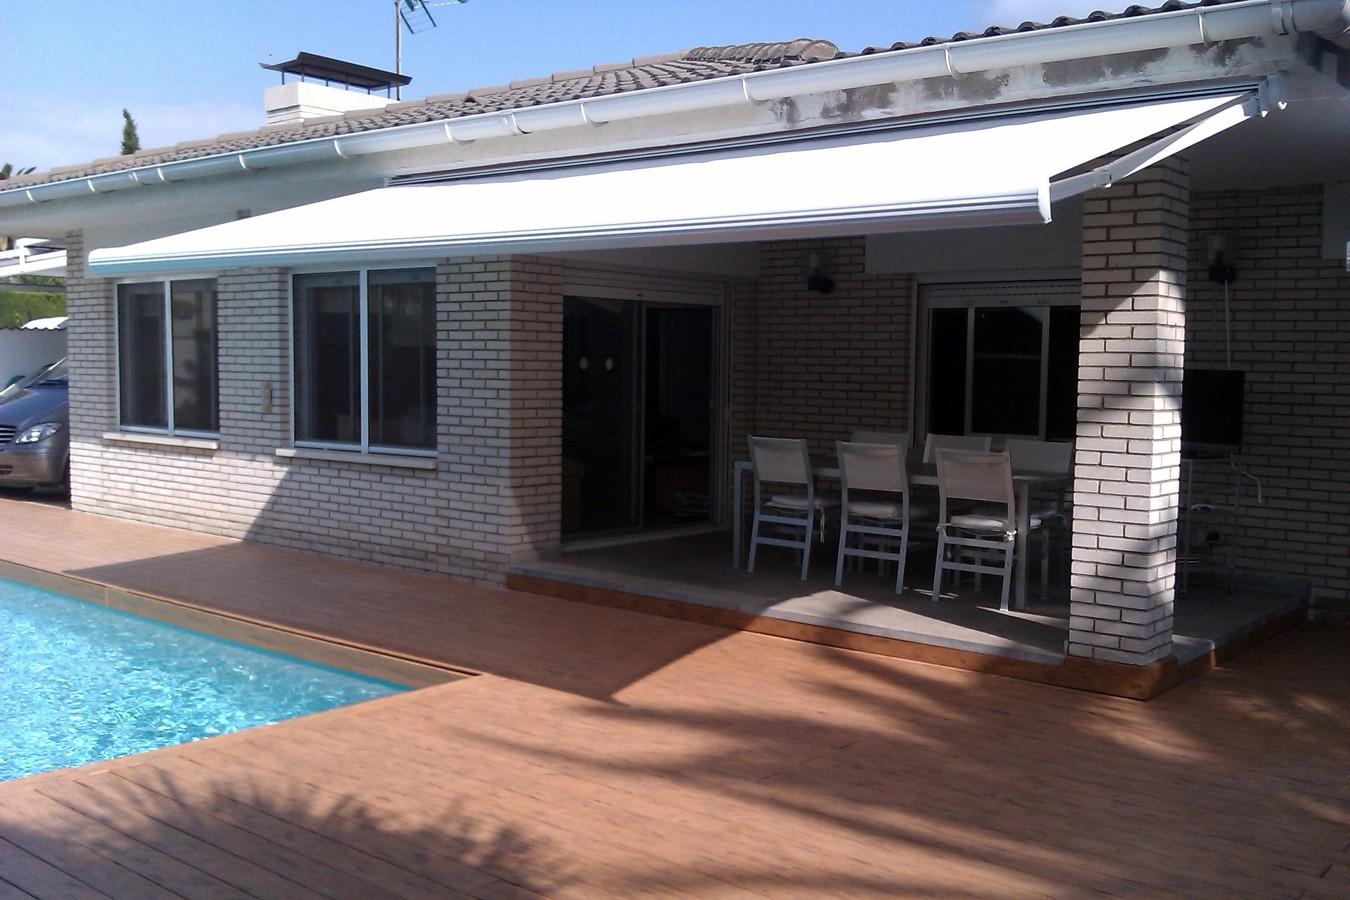 Foto toldo de terraza modelo cofre y motorizado de - Toldo de terraza ...